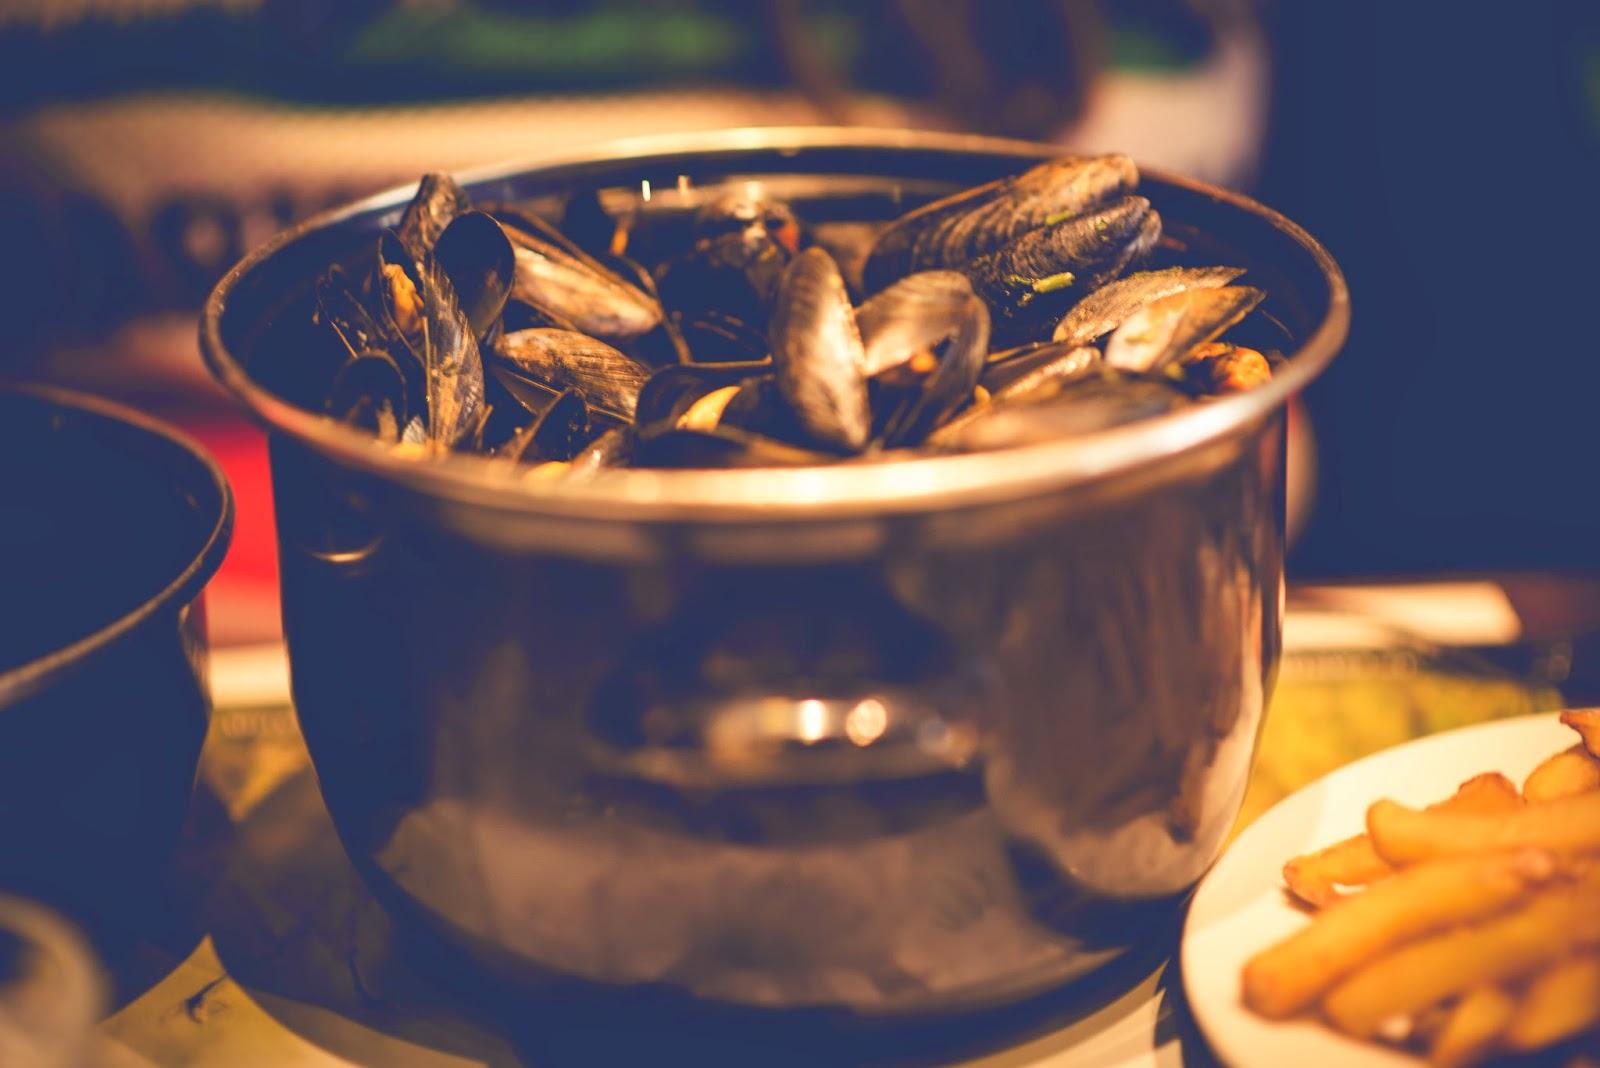 lyon france liquidgrain liquid grain mussels fish seafood sea food